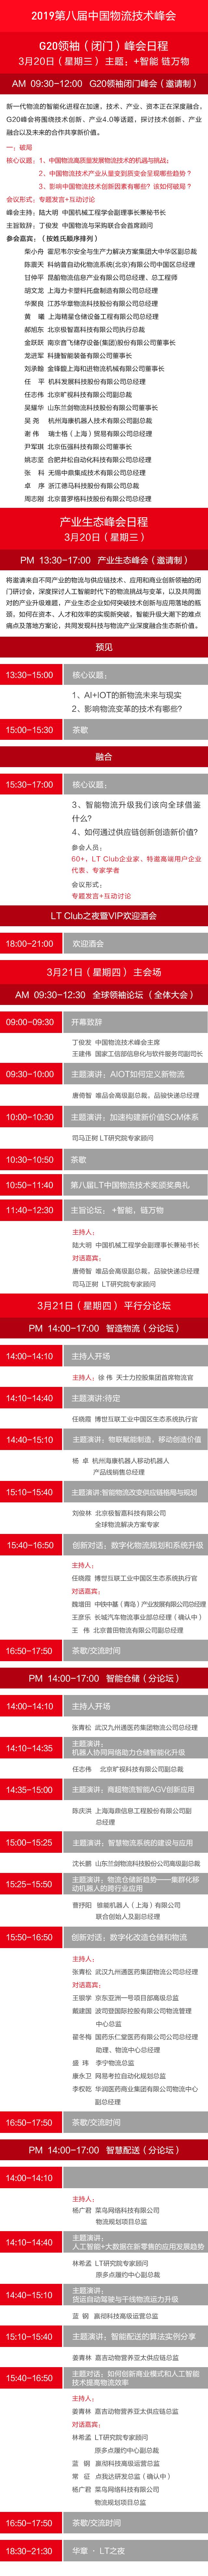 2019LT中国物流技术峰会(北京)